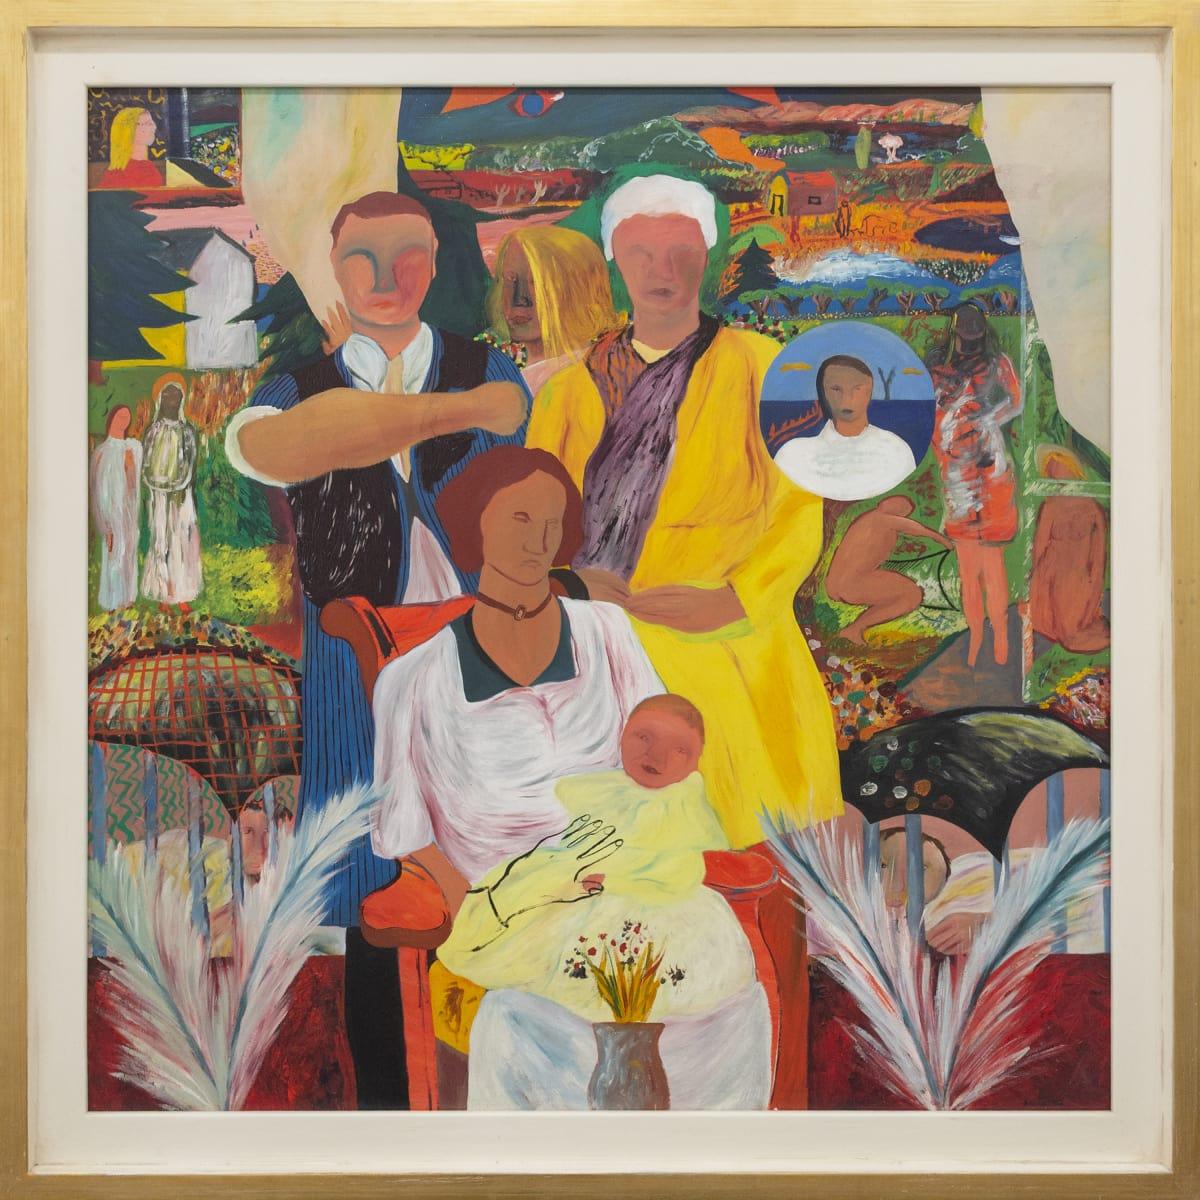 Jeffrey Harris, Family Portrait, c. 1974